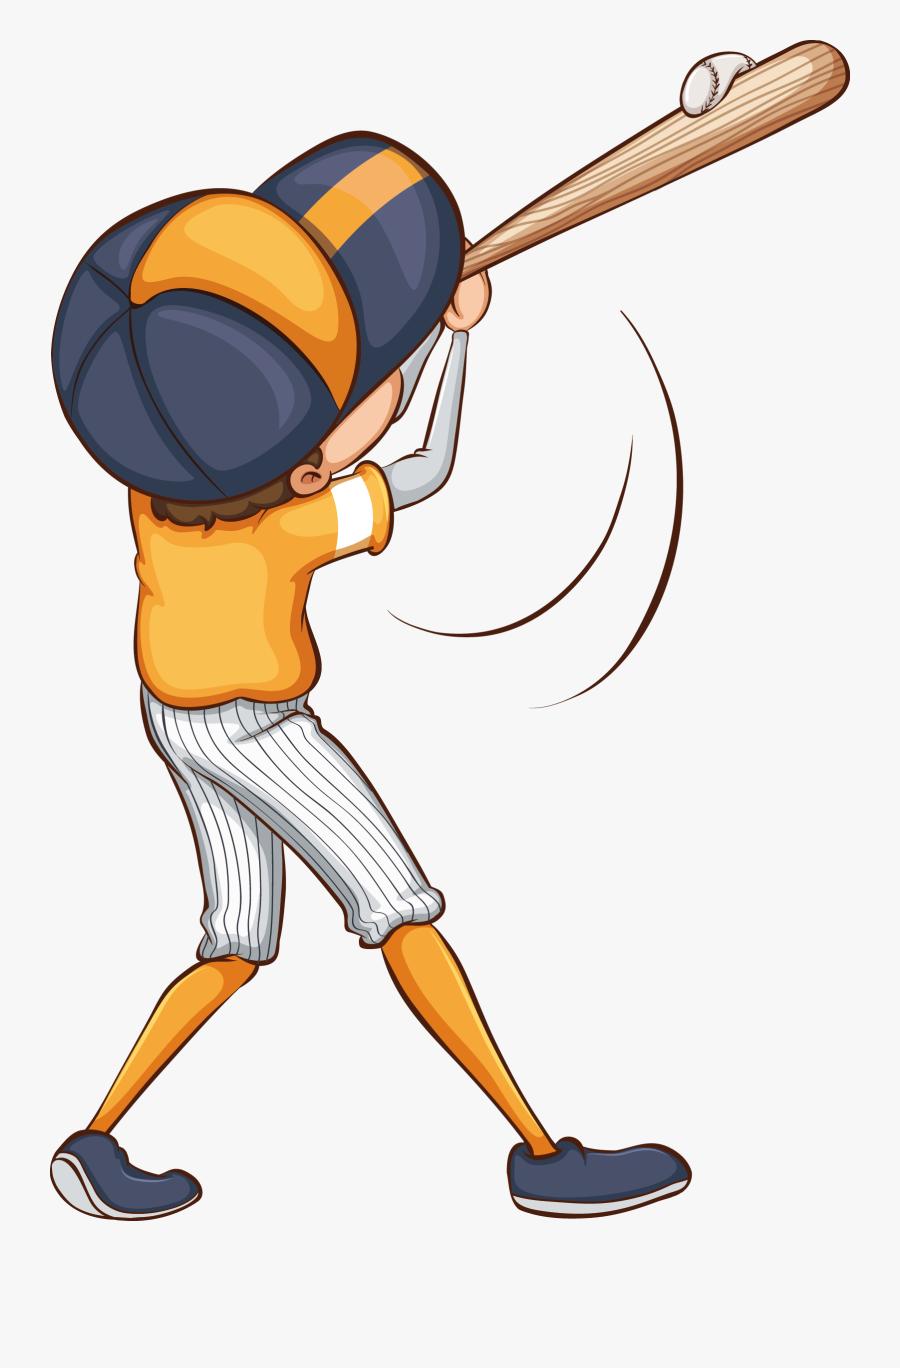 Transparent Bat Clip Art - Simple Drawing Of A Baseball Game, Transparent Clipart